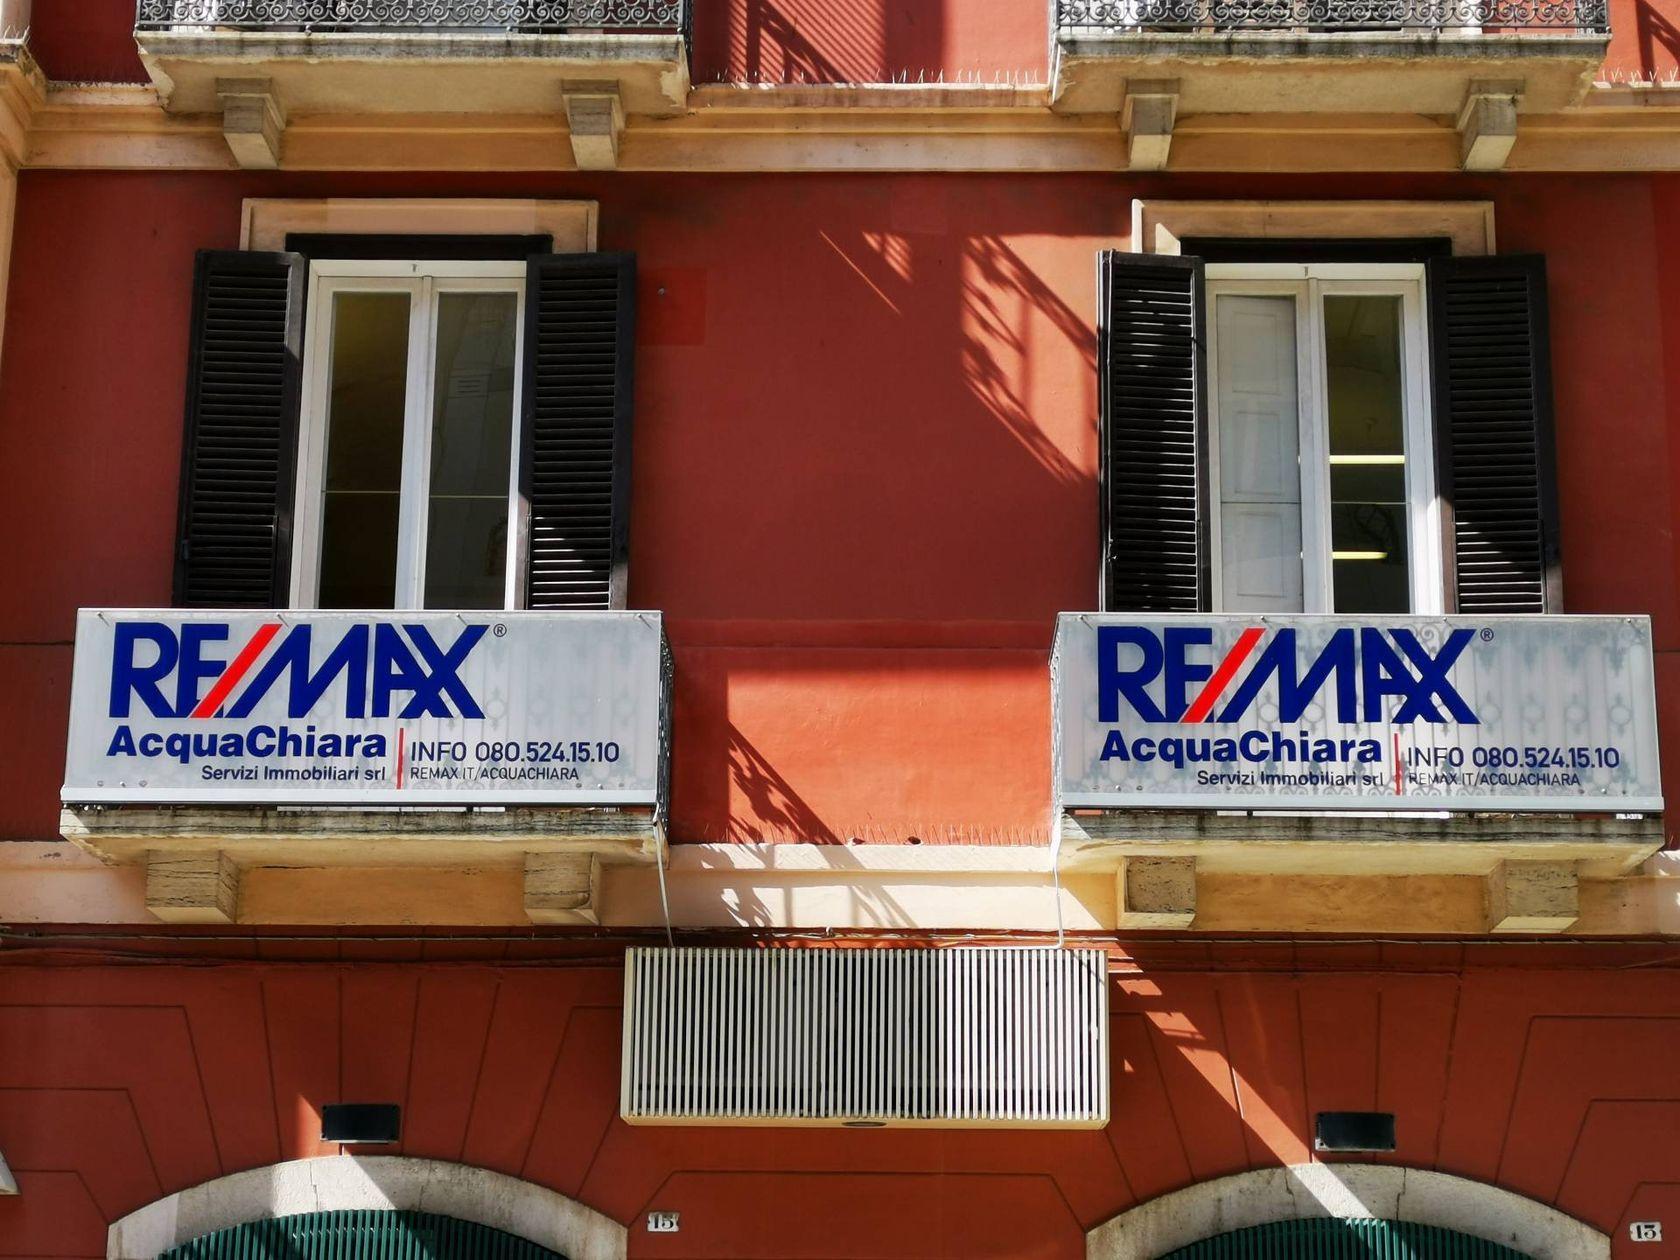 RE/MAX Acquachiara Bari - Foto 2